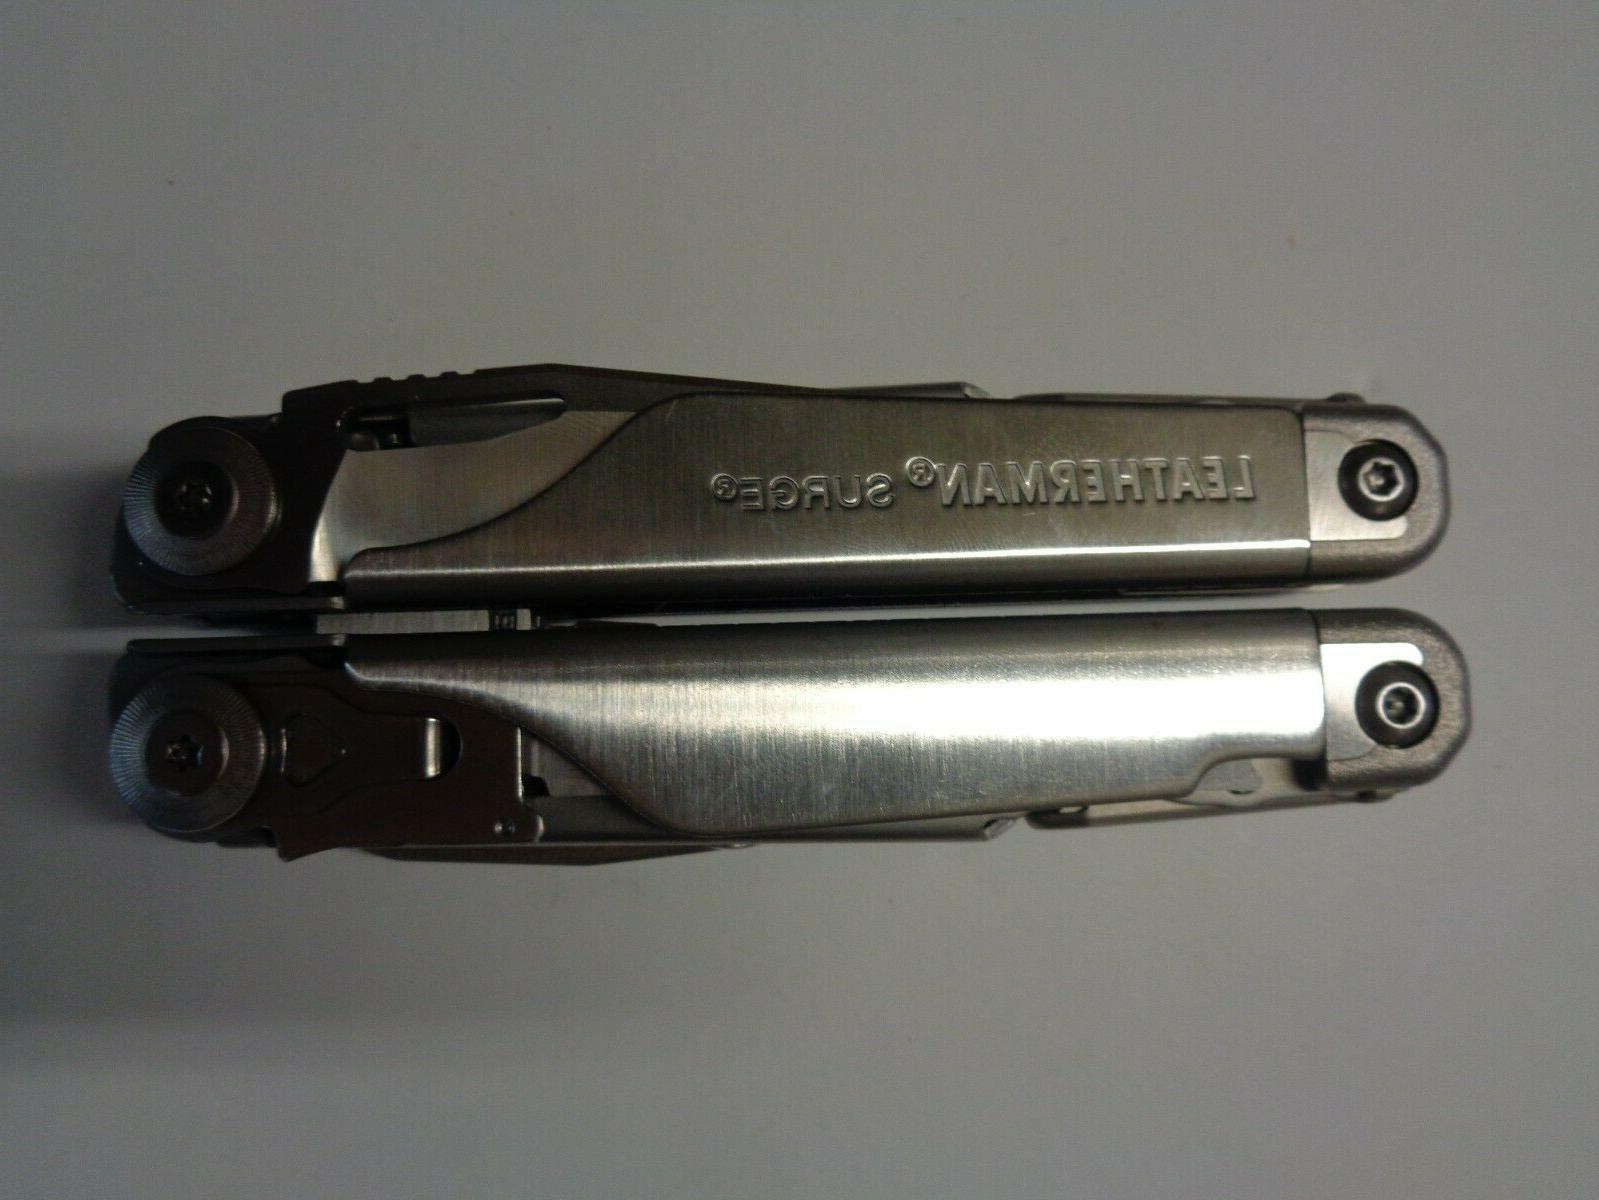 NEW Multi-Tool Stainless Steel Sheath